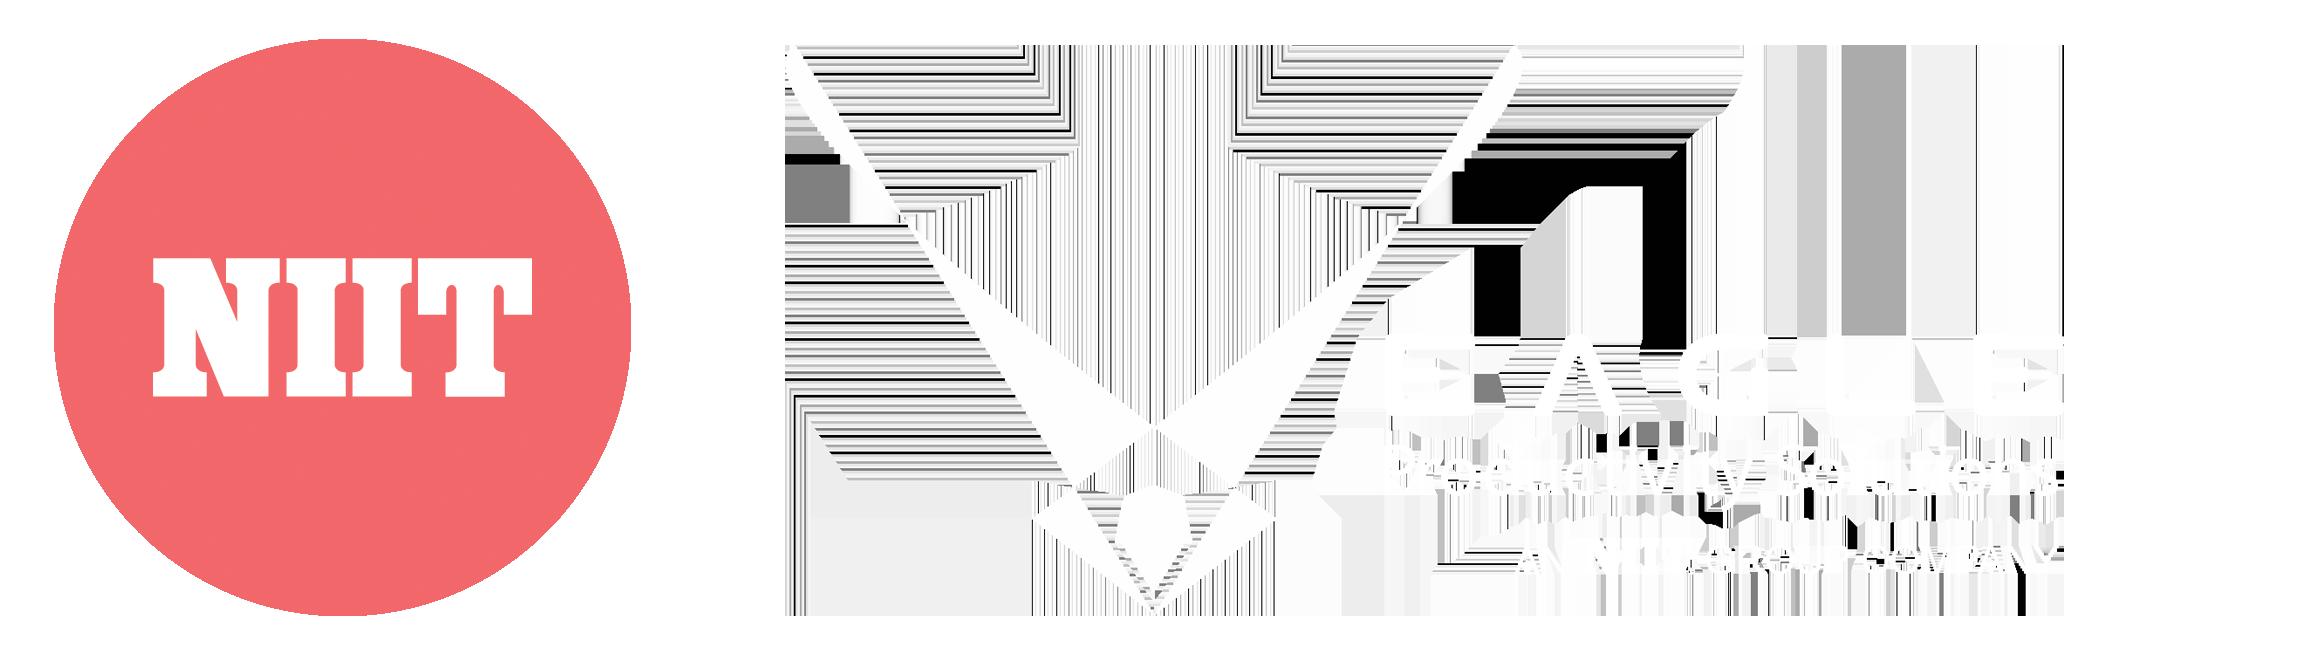 Stabilize_logo_eagle_horiz_white